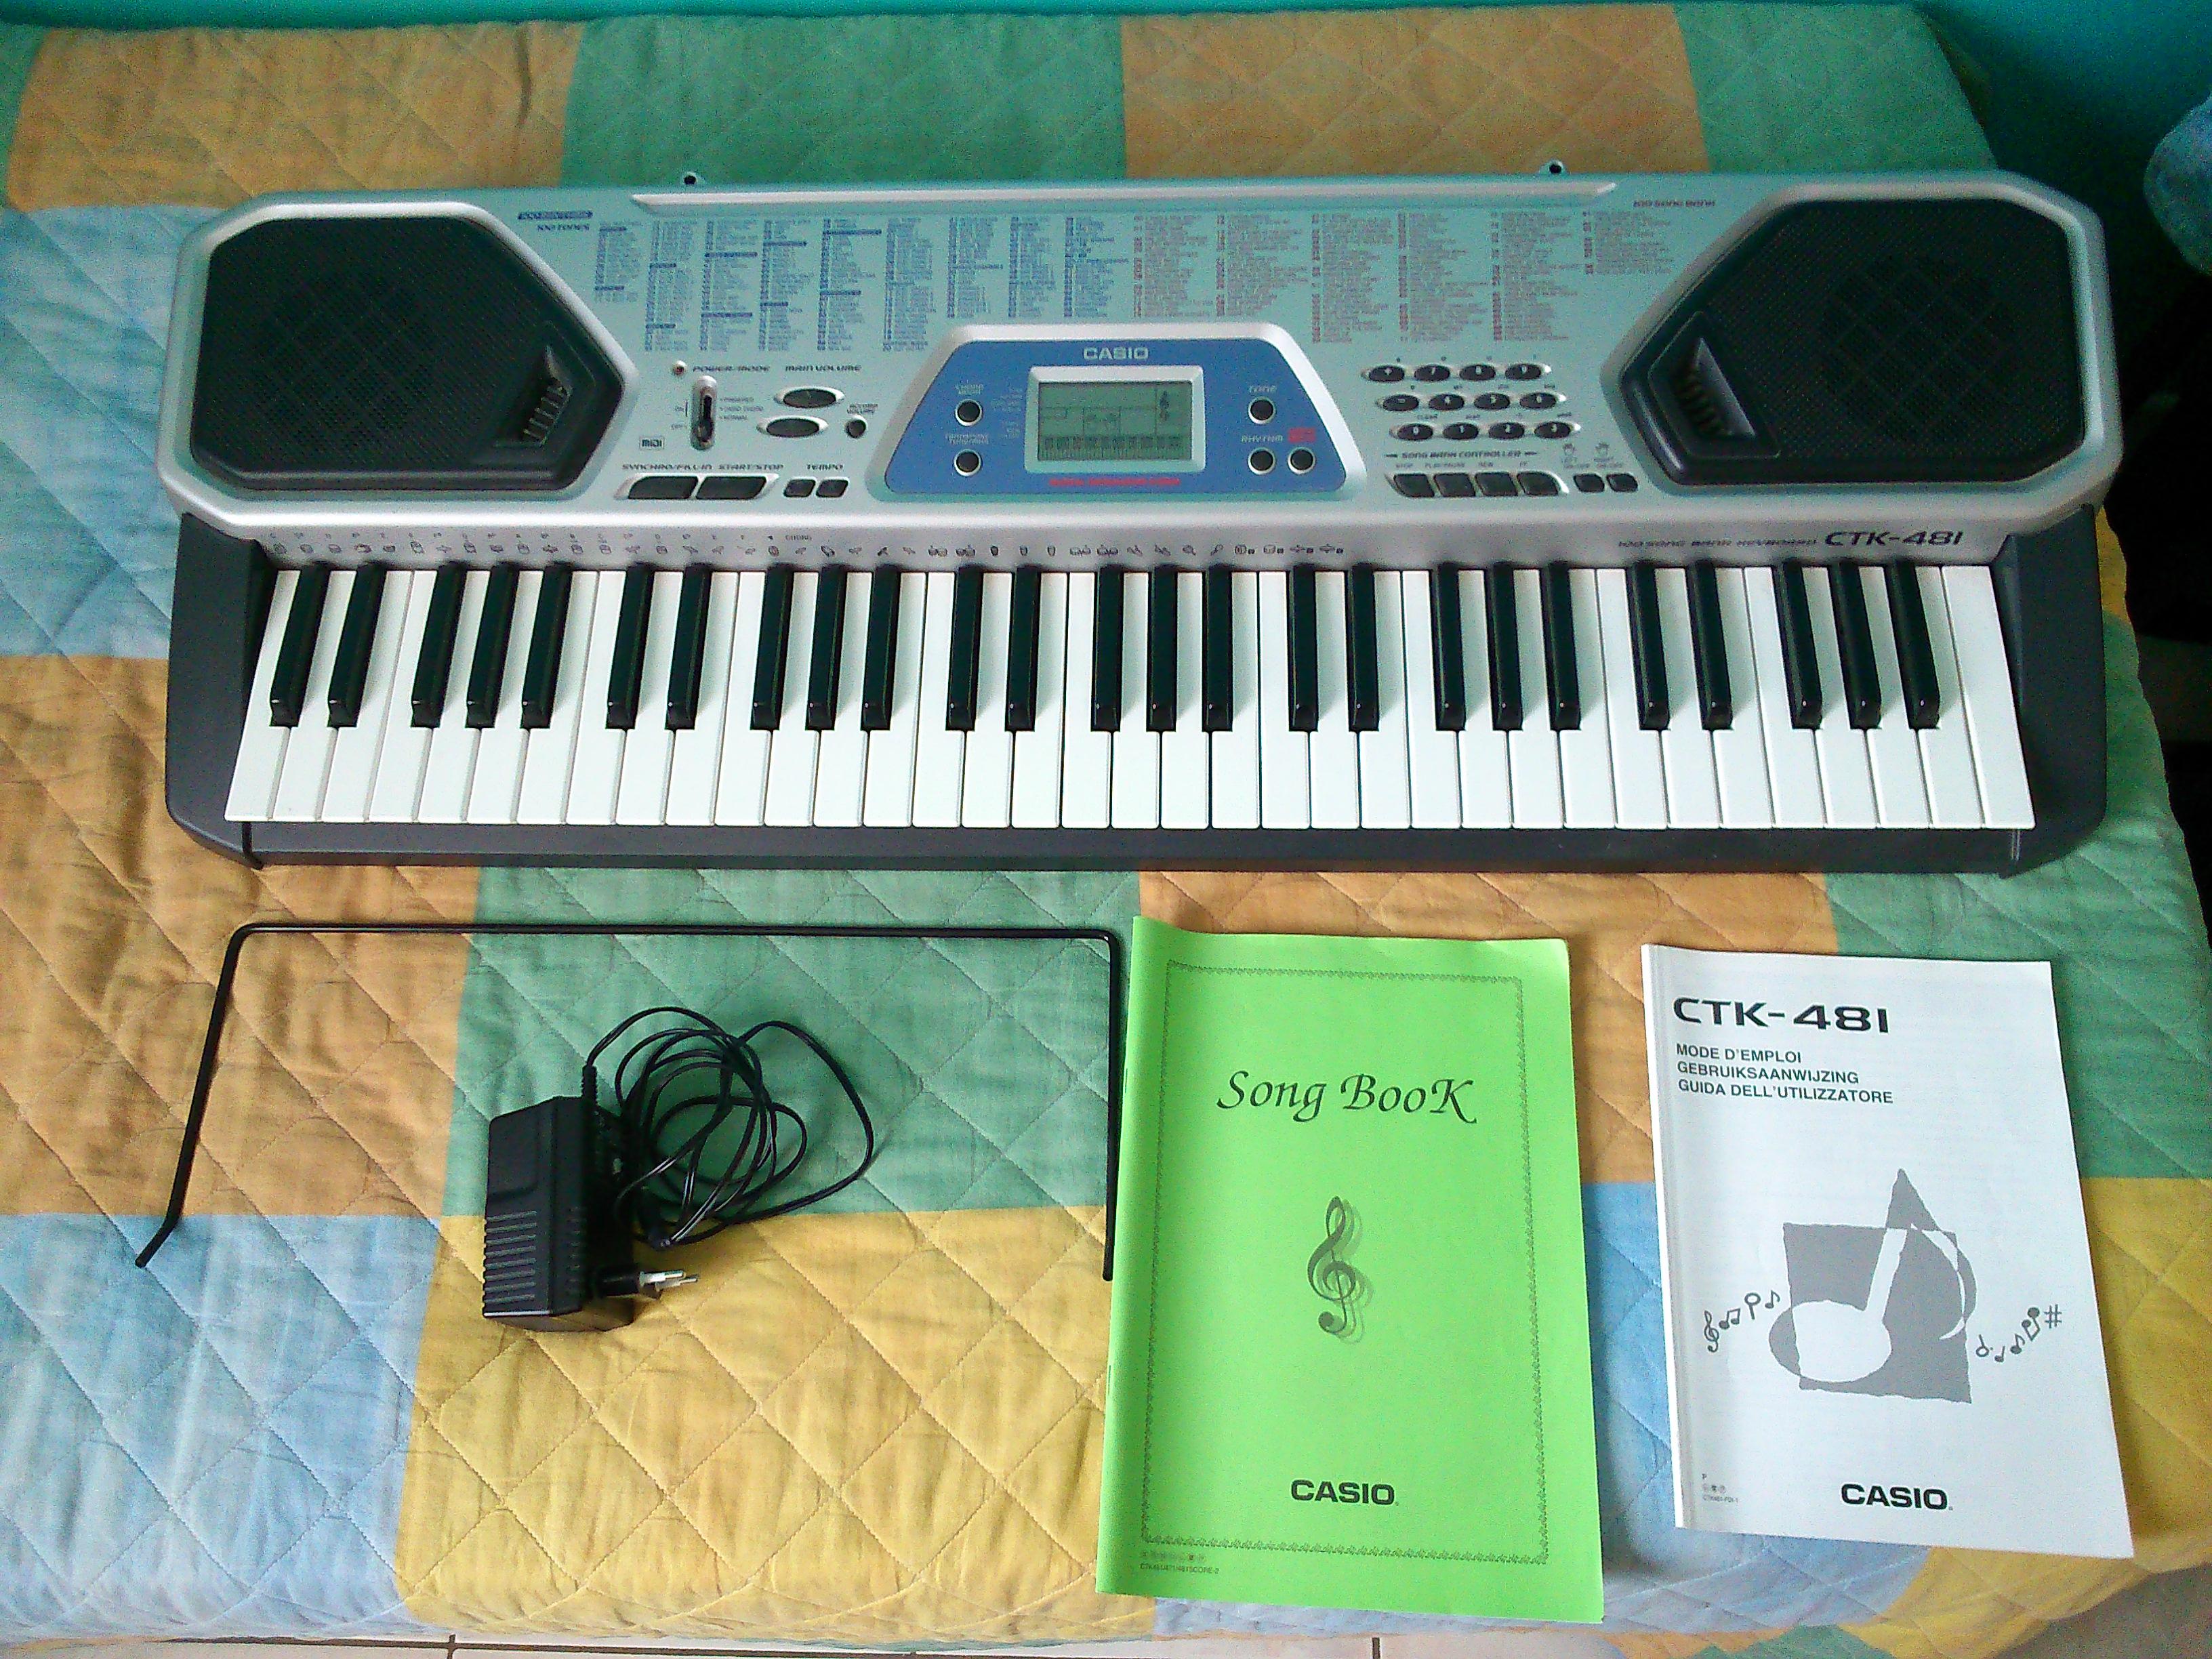 casio ctk 481 image 873634 audiofanzine rh en audiofanzine com Electronic Keyboard Casio Ctk 671 Casio Ctk 511 Keyboard